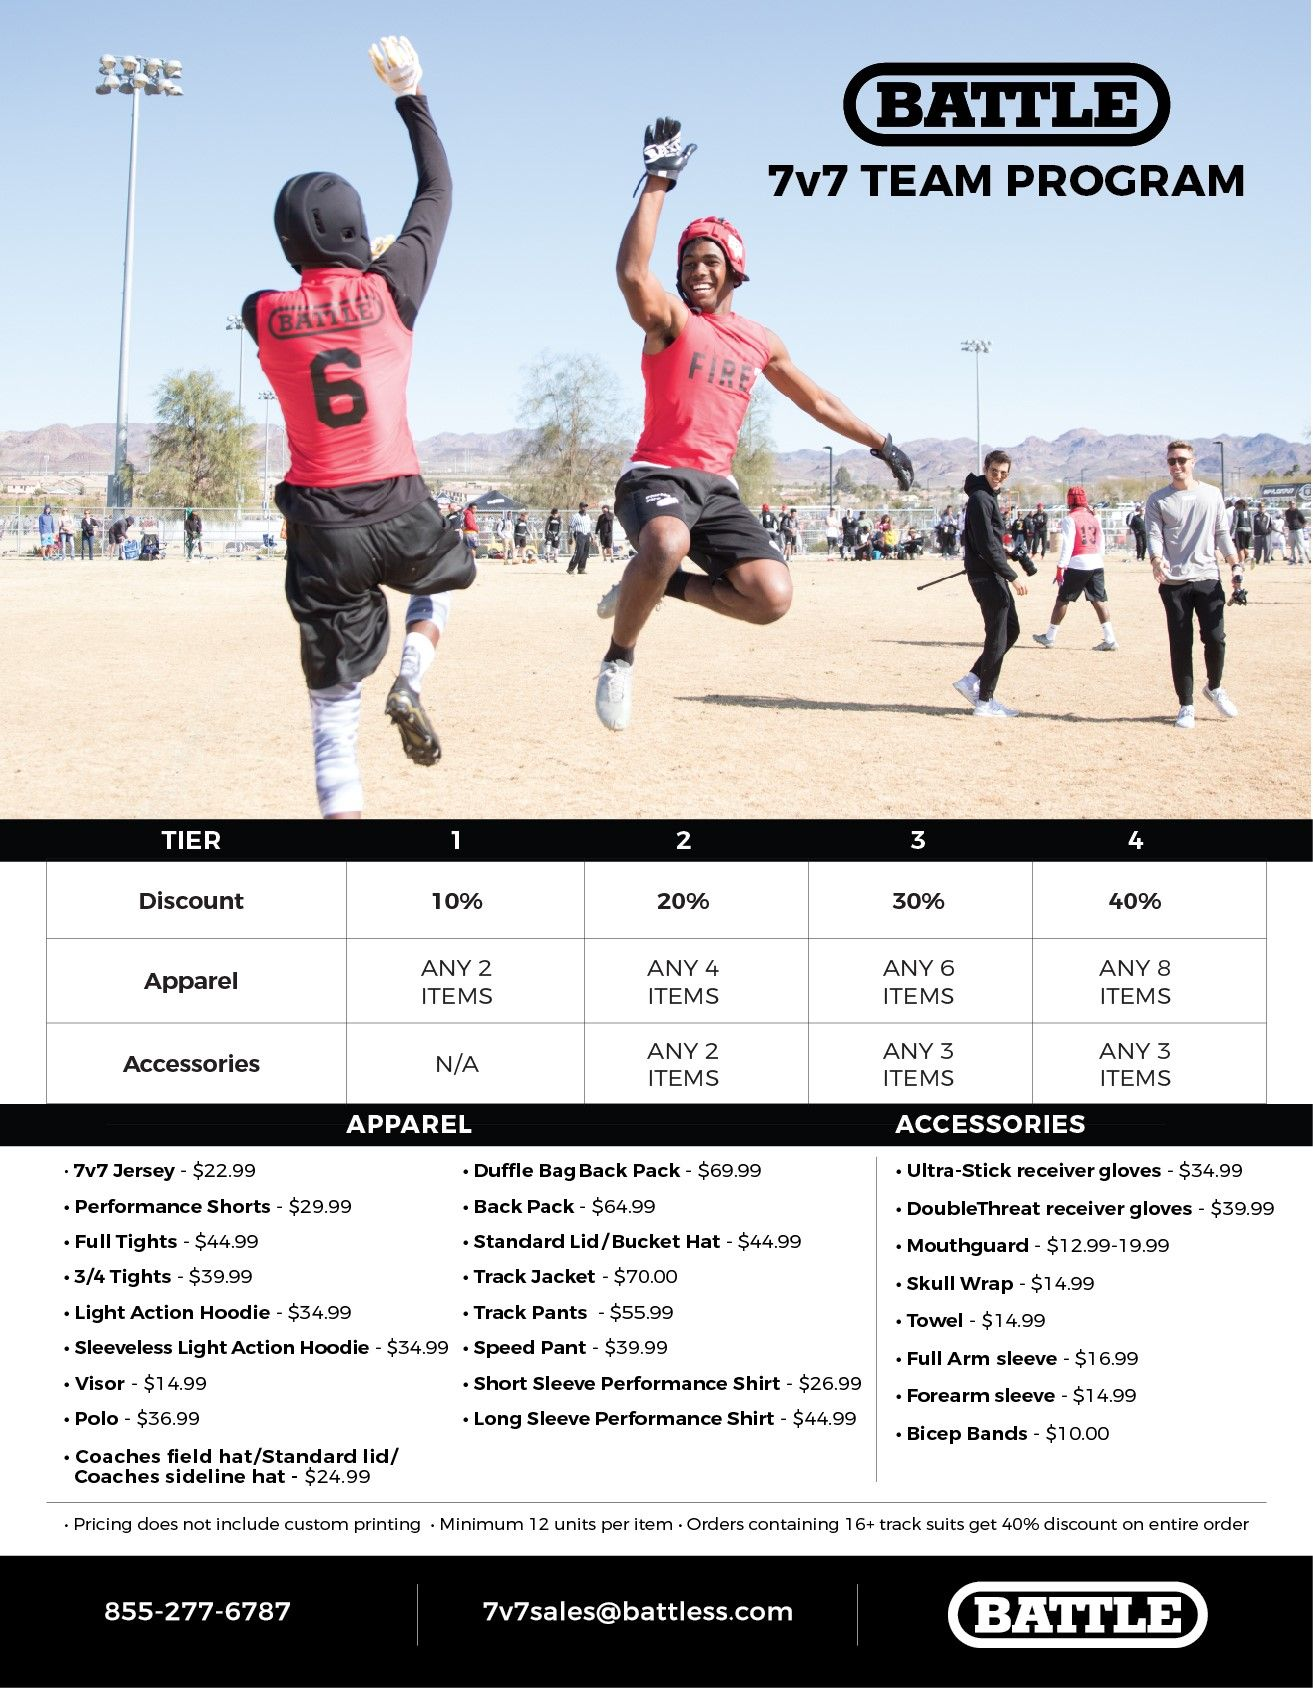 7v7 uniform program uniform performance shorts soccer